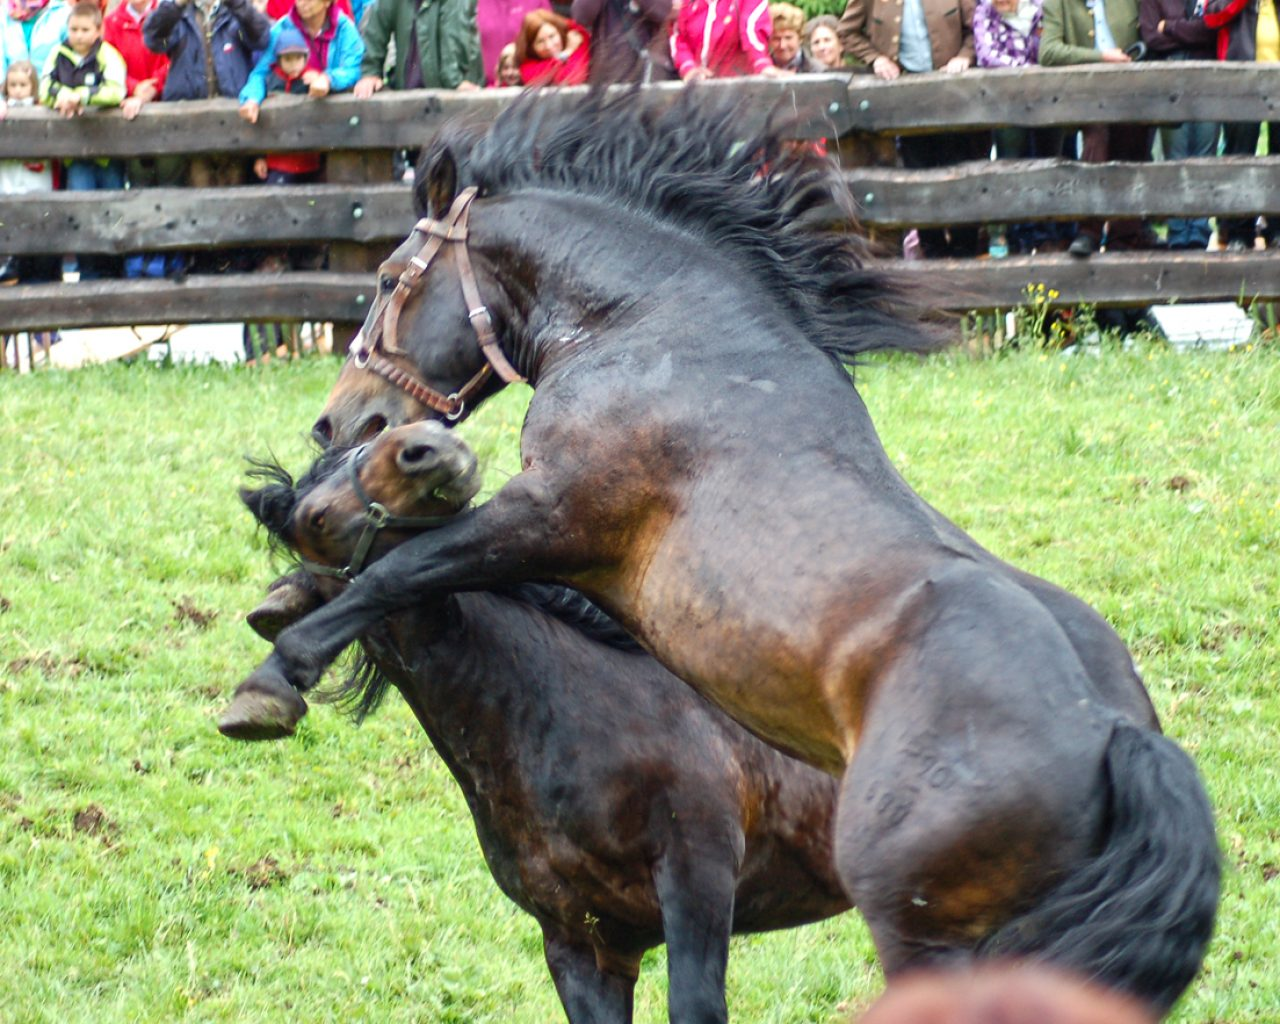 Pferdekämpfe